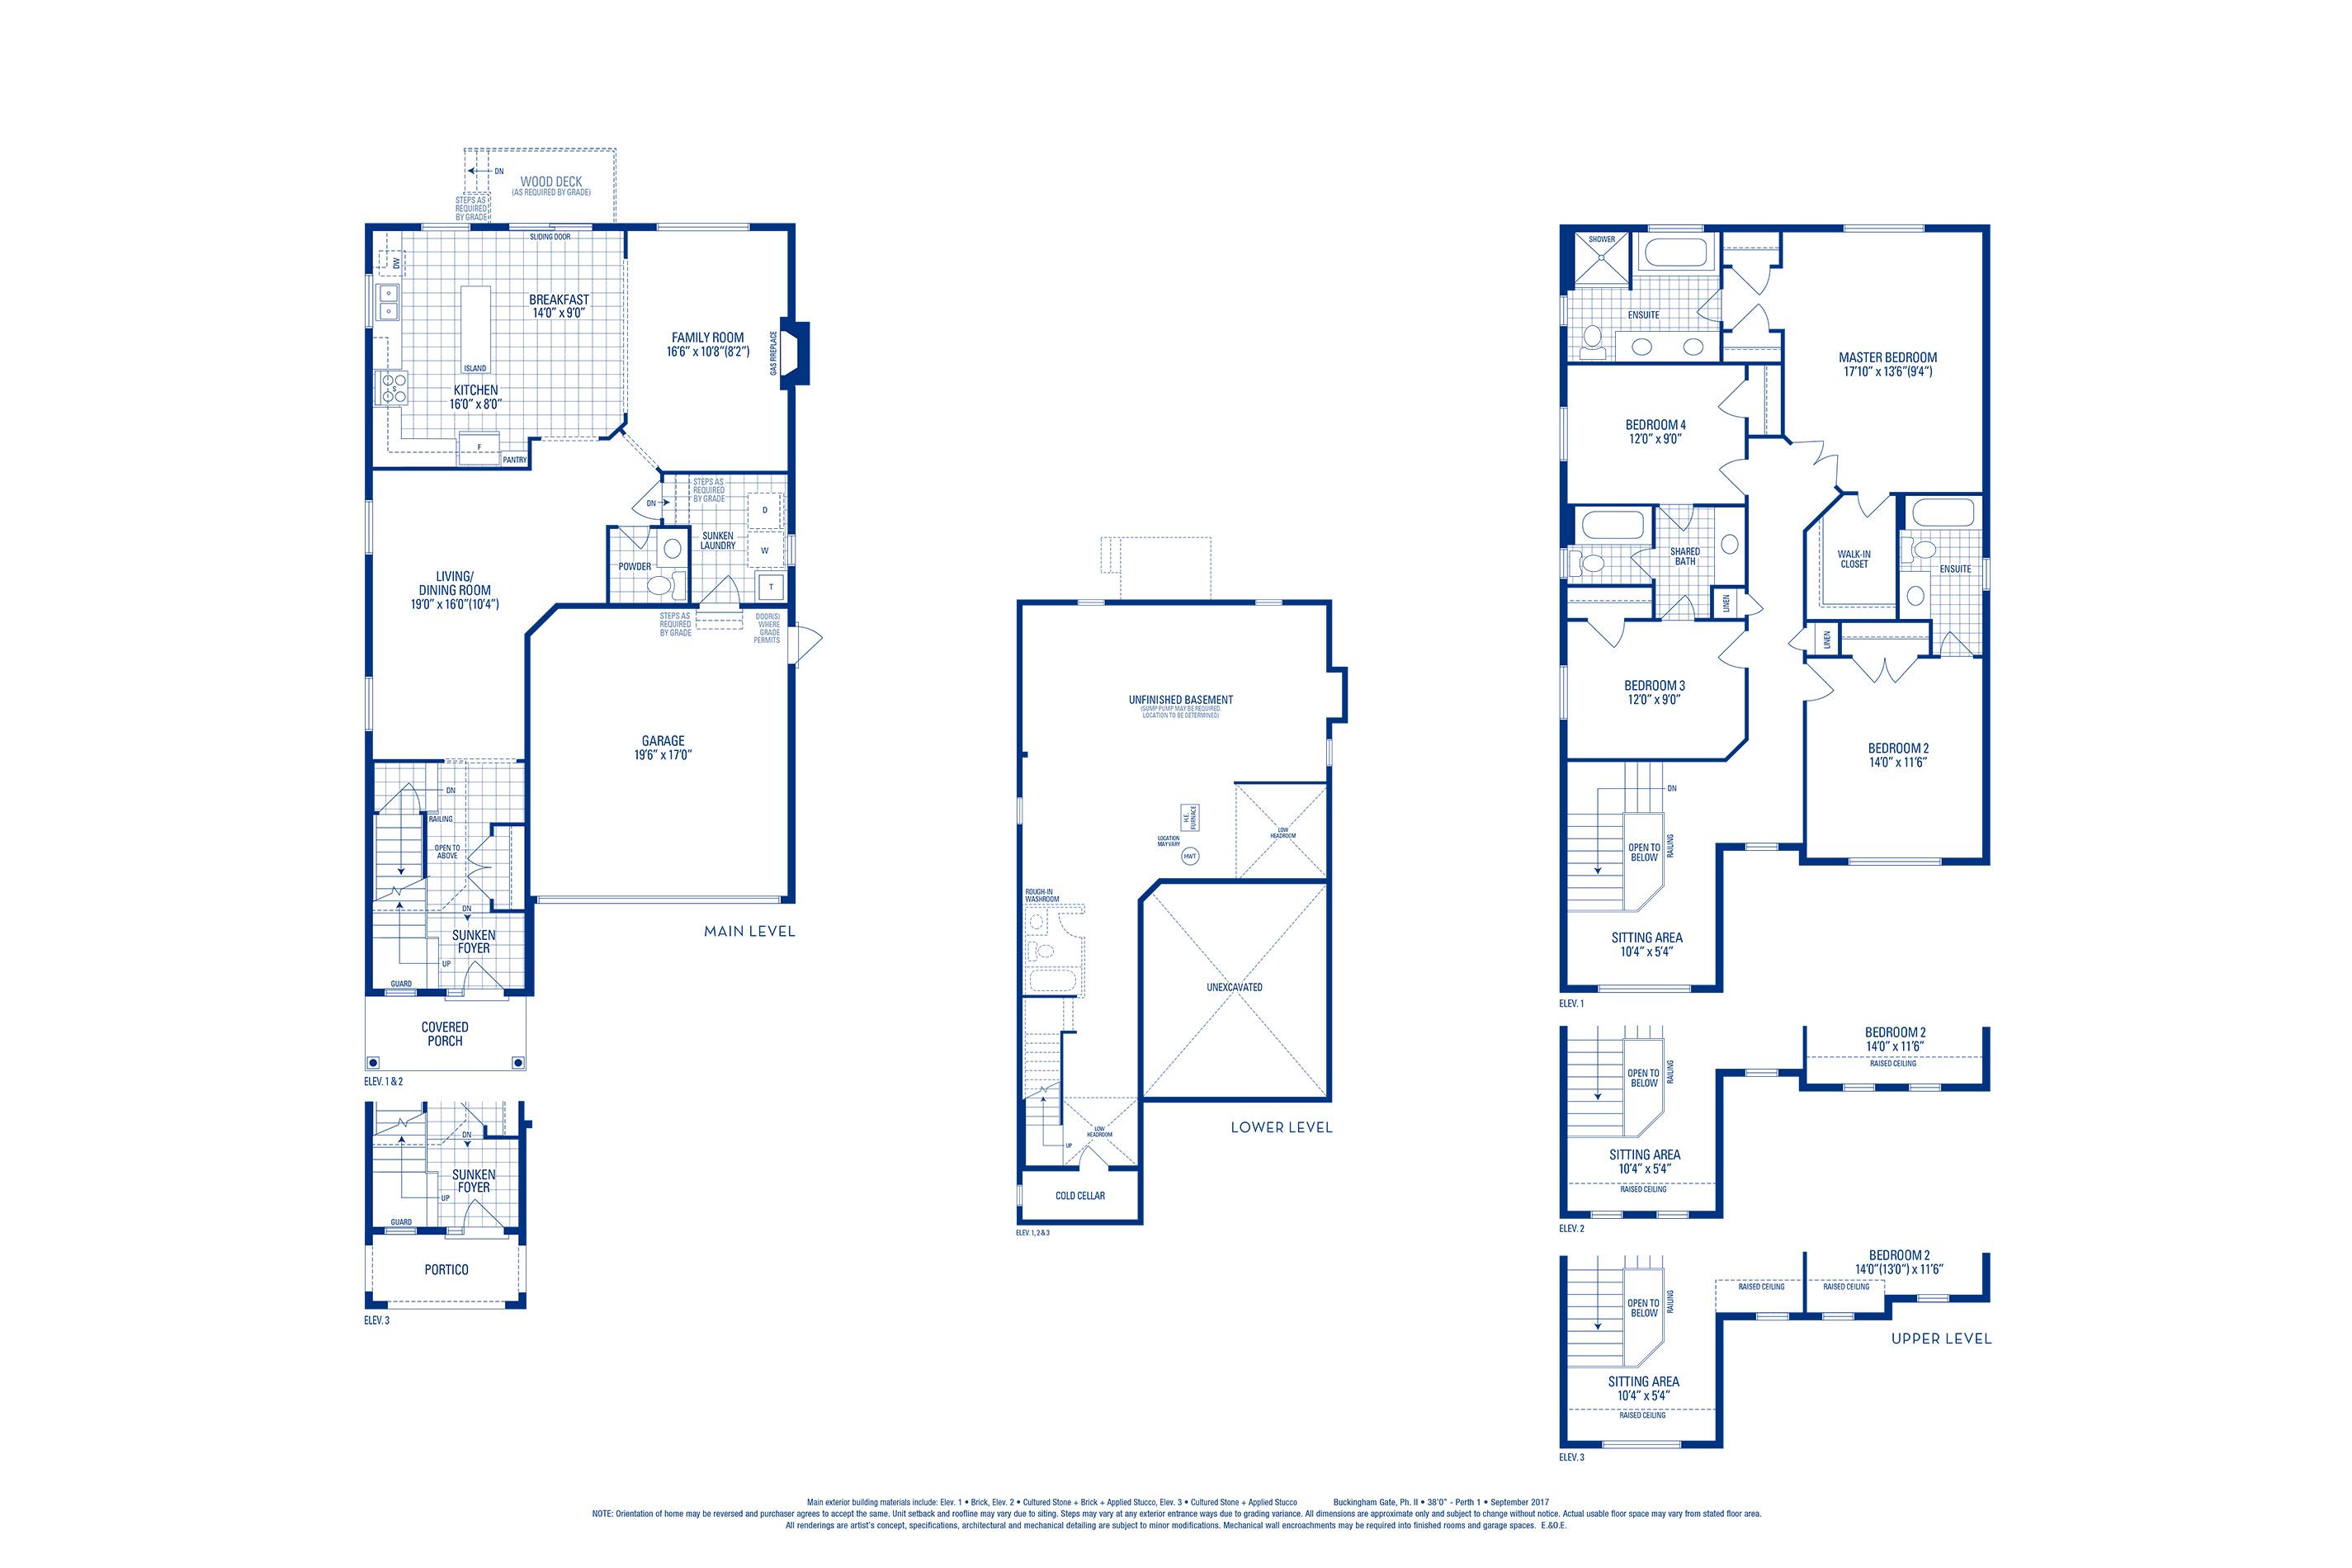 Perth 01 Elev. 3 Floorplan Thumbnail